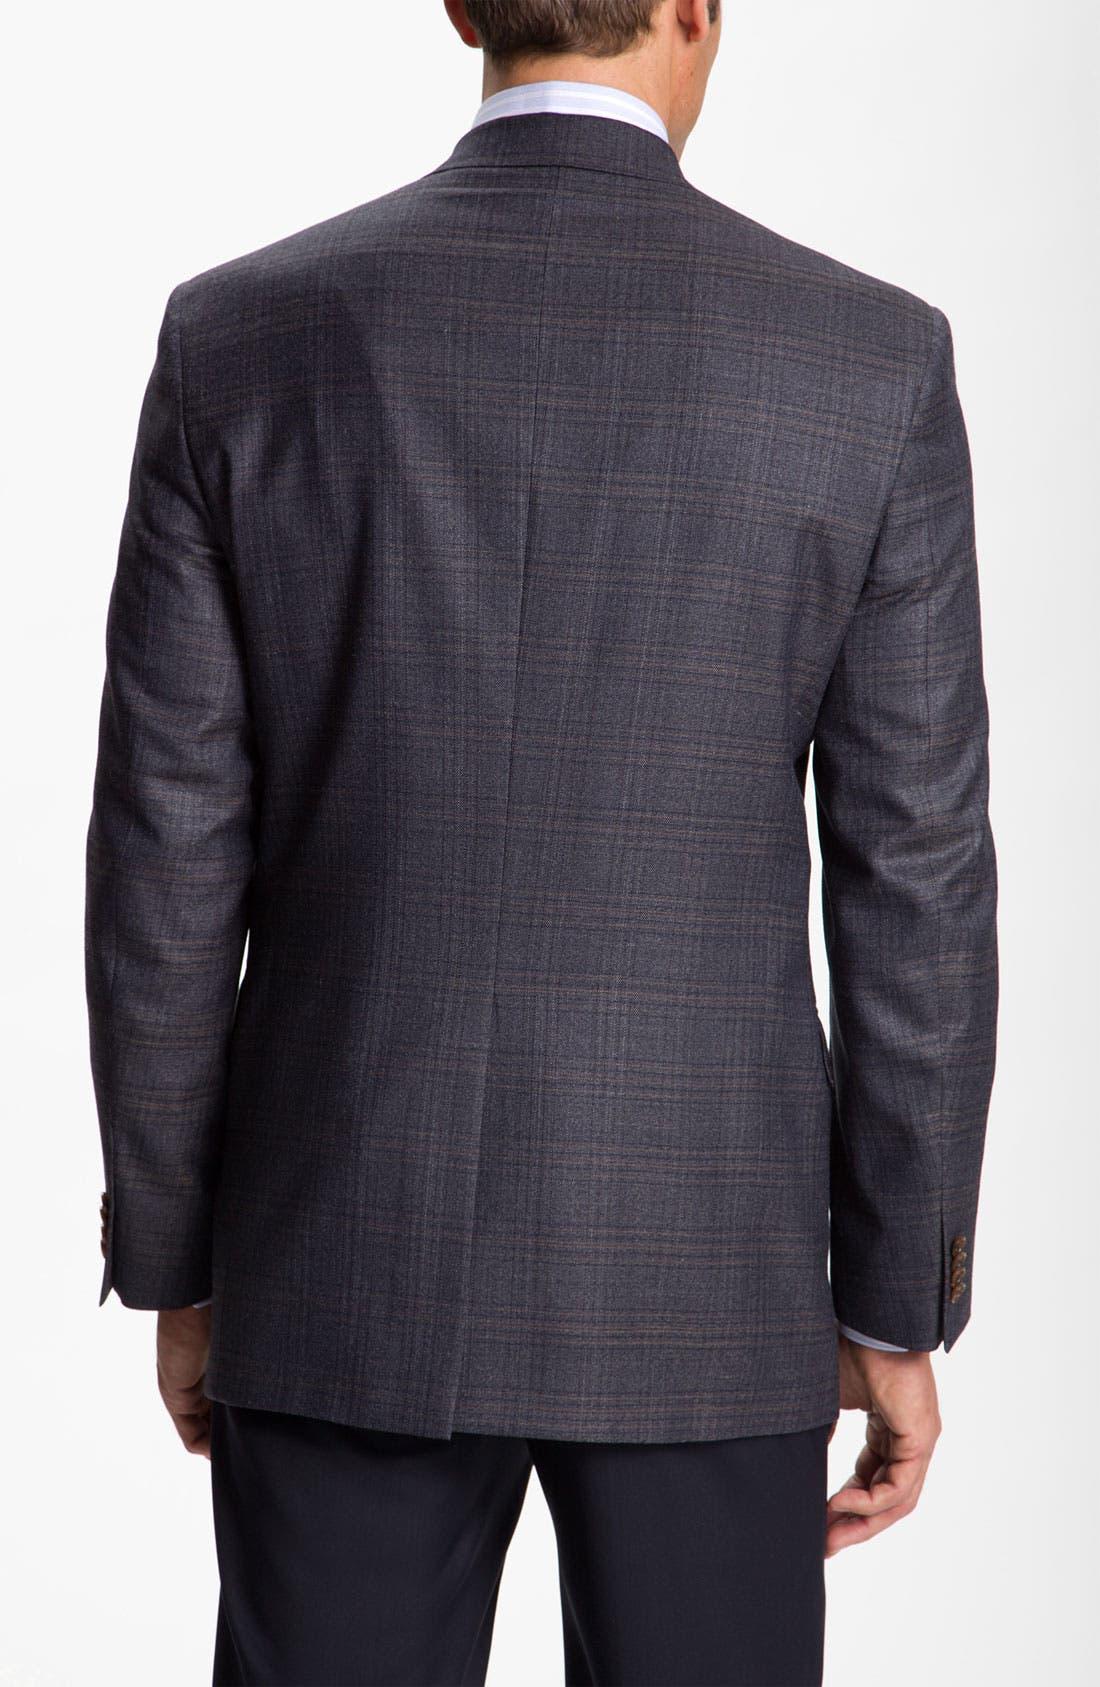 HART SCHAFFNER MARX, Plaid Sportcoat, Alternate thumbnail 2, color, 401